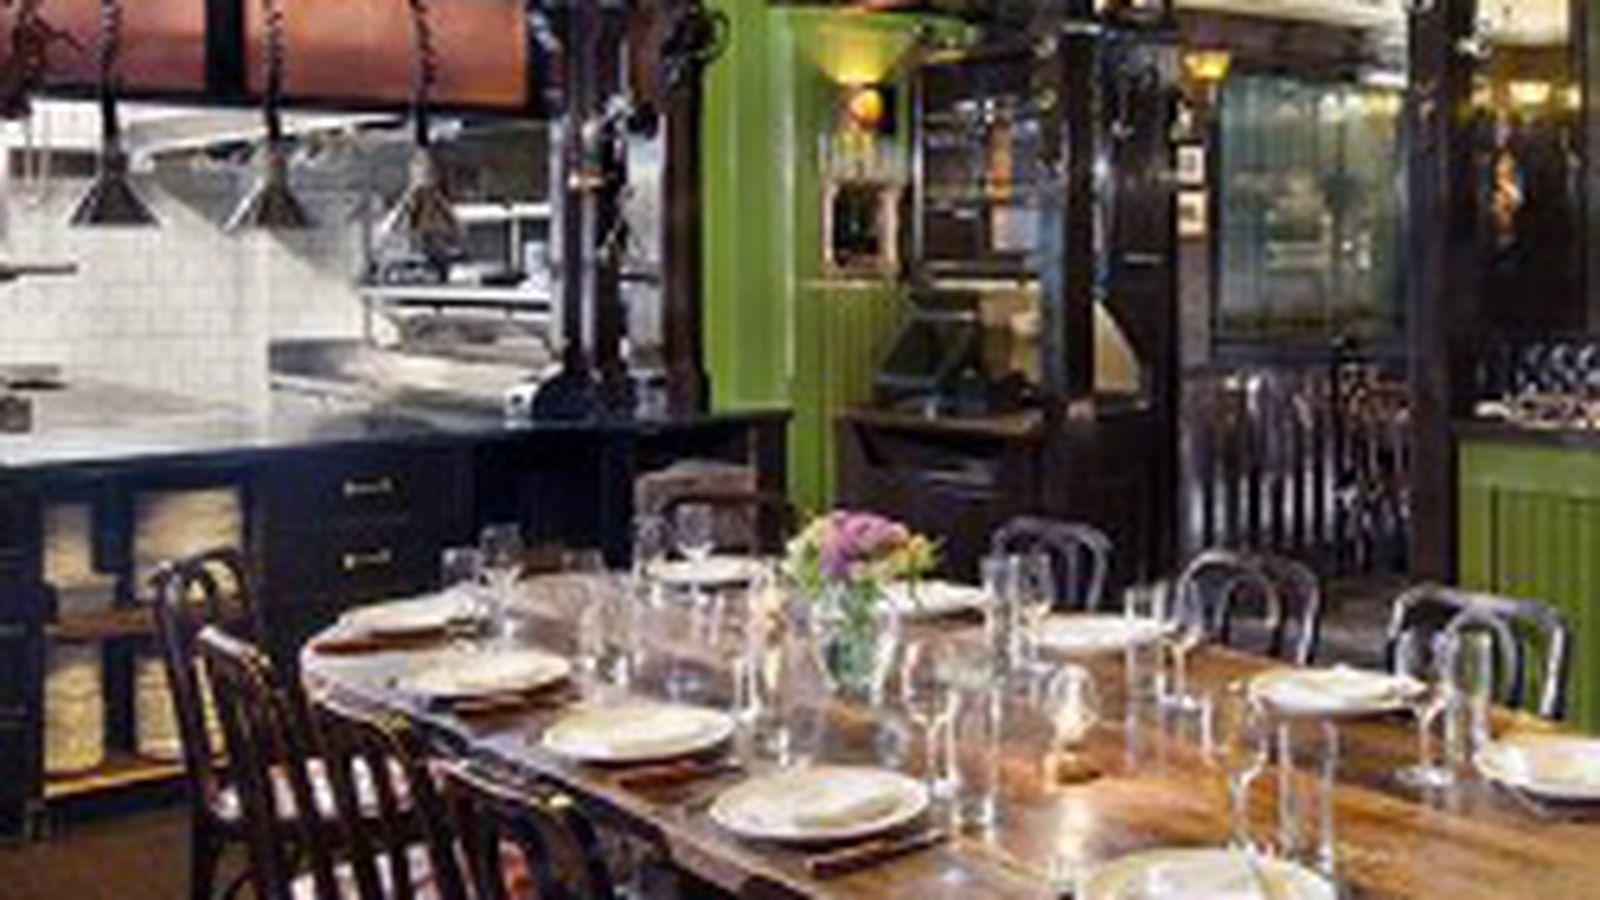 The Breslin Bar And Dining Room The Breslin Bar Amp Dining Room Eater Ny